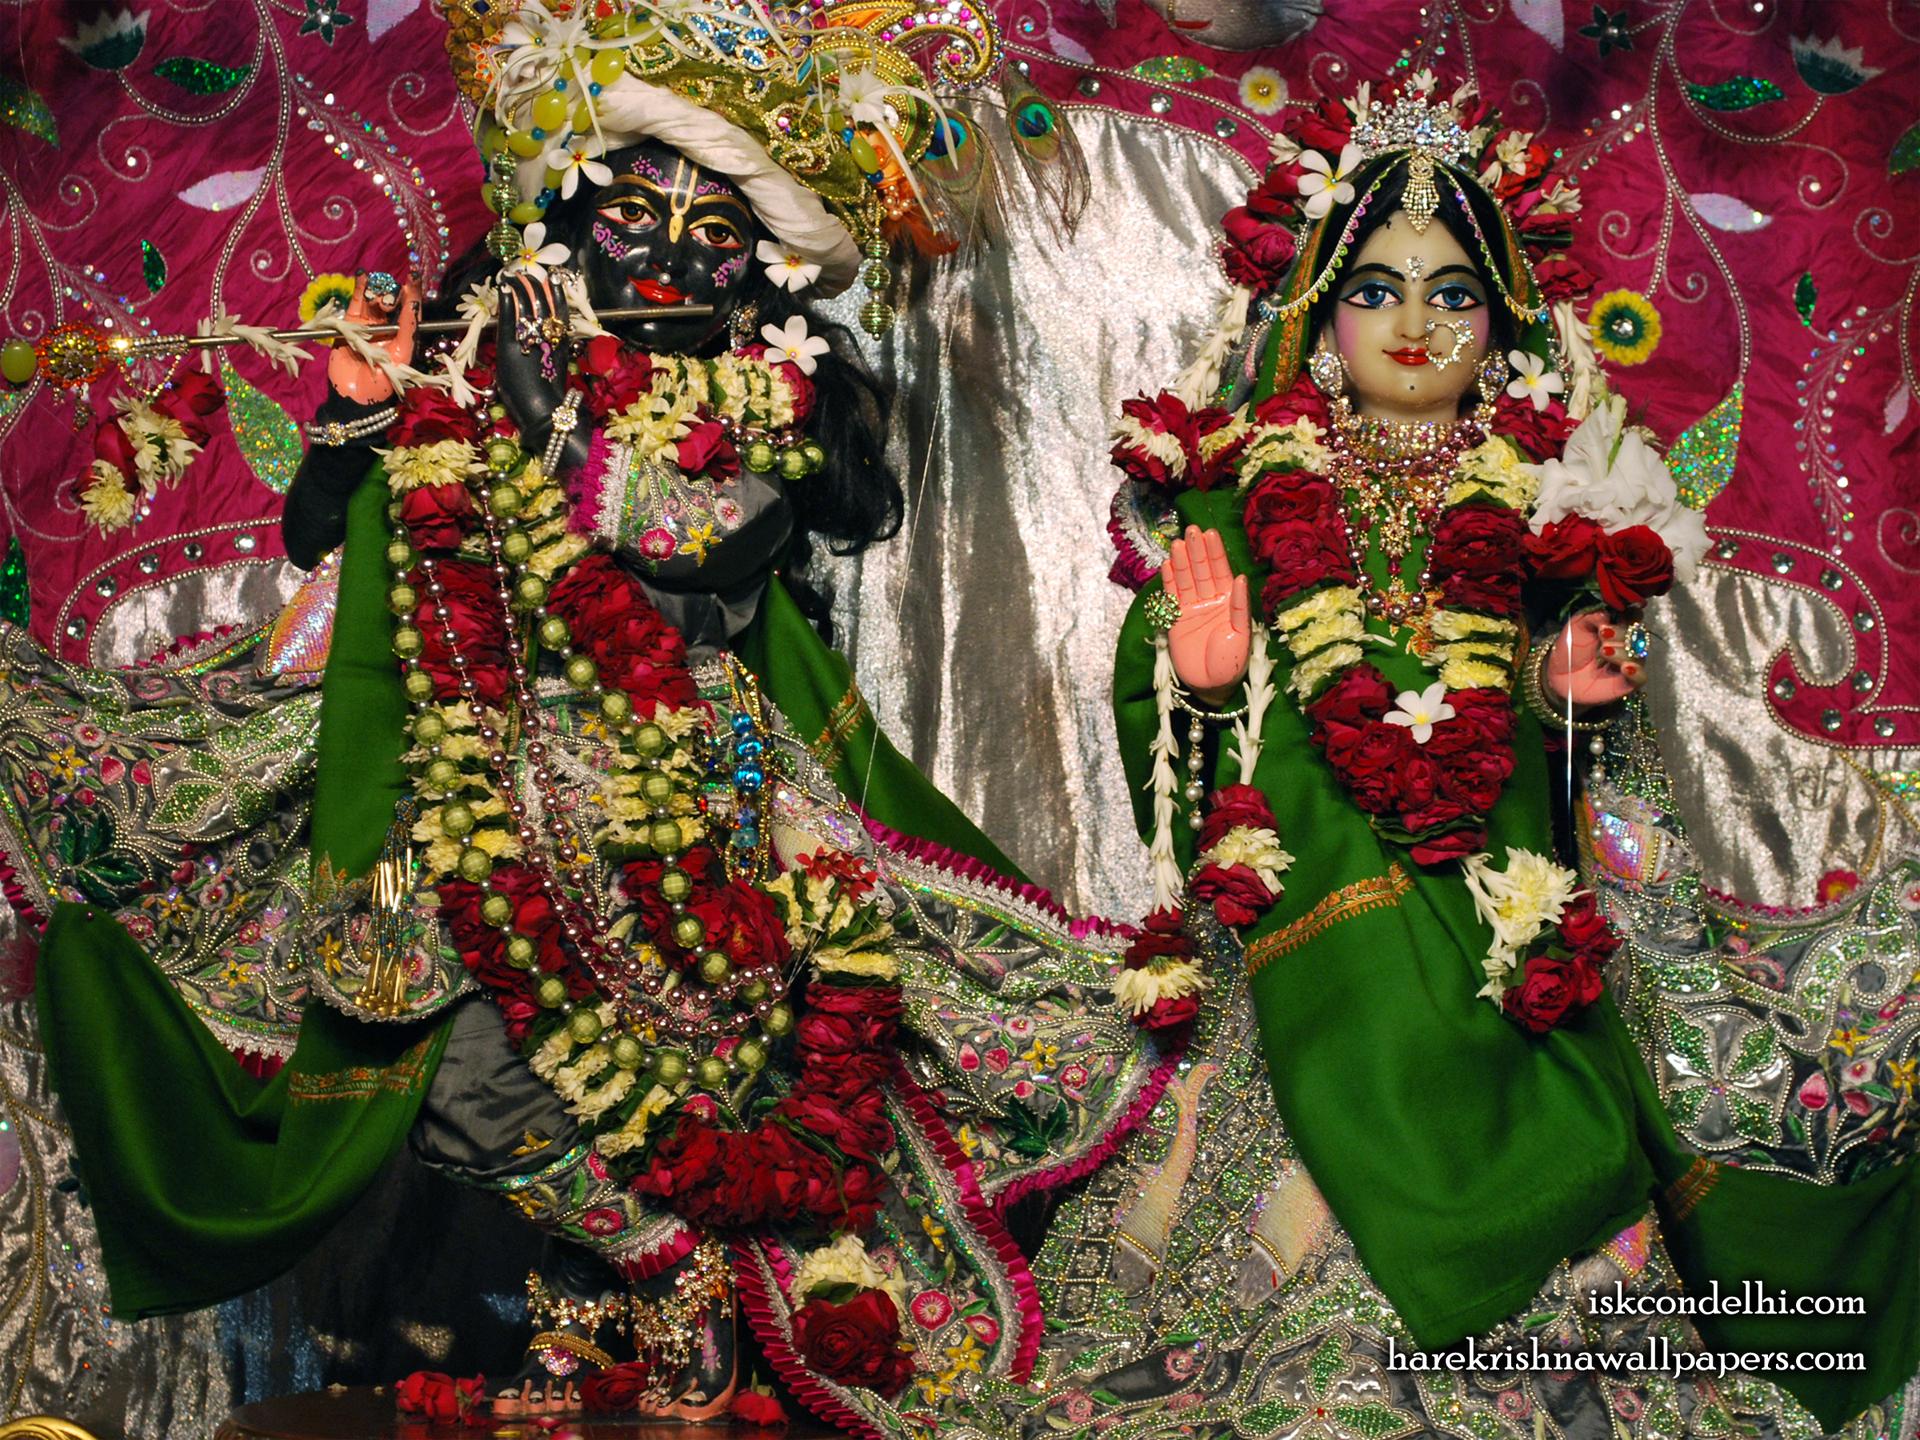 Sri Sri Radha Parthasarathi Wallpaper (006) Size 1920x1440 Download